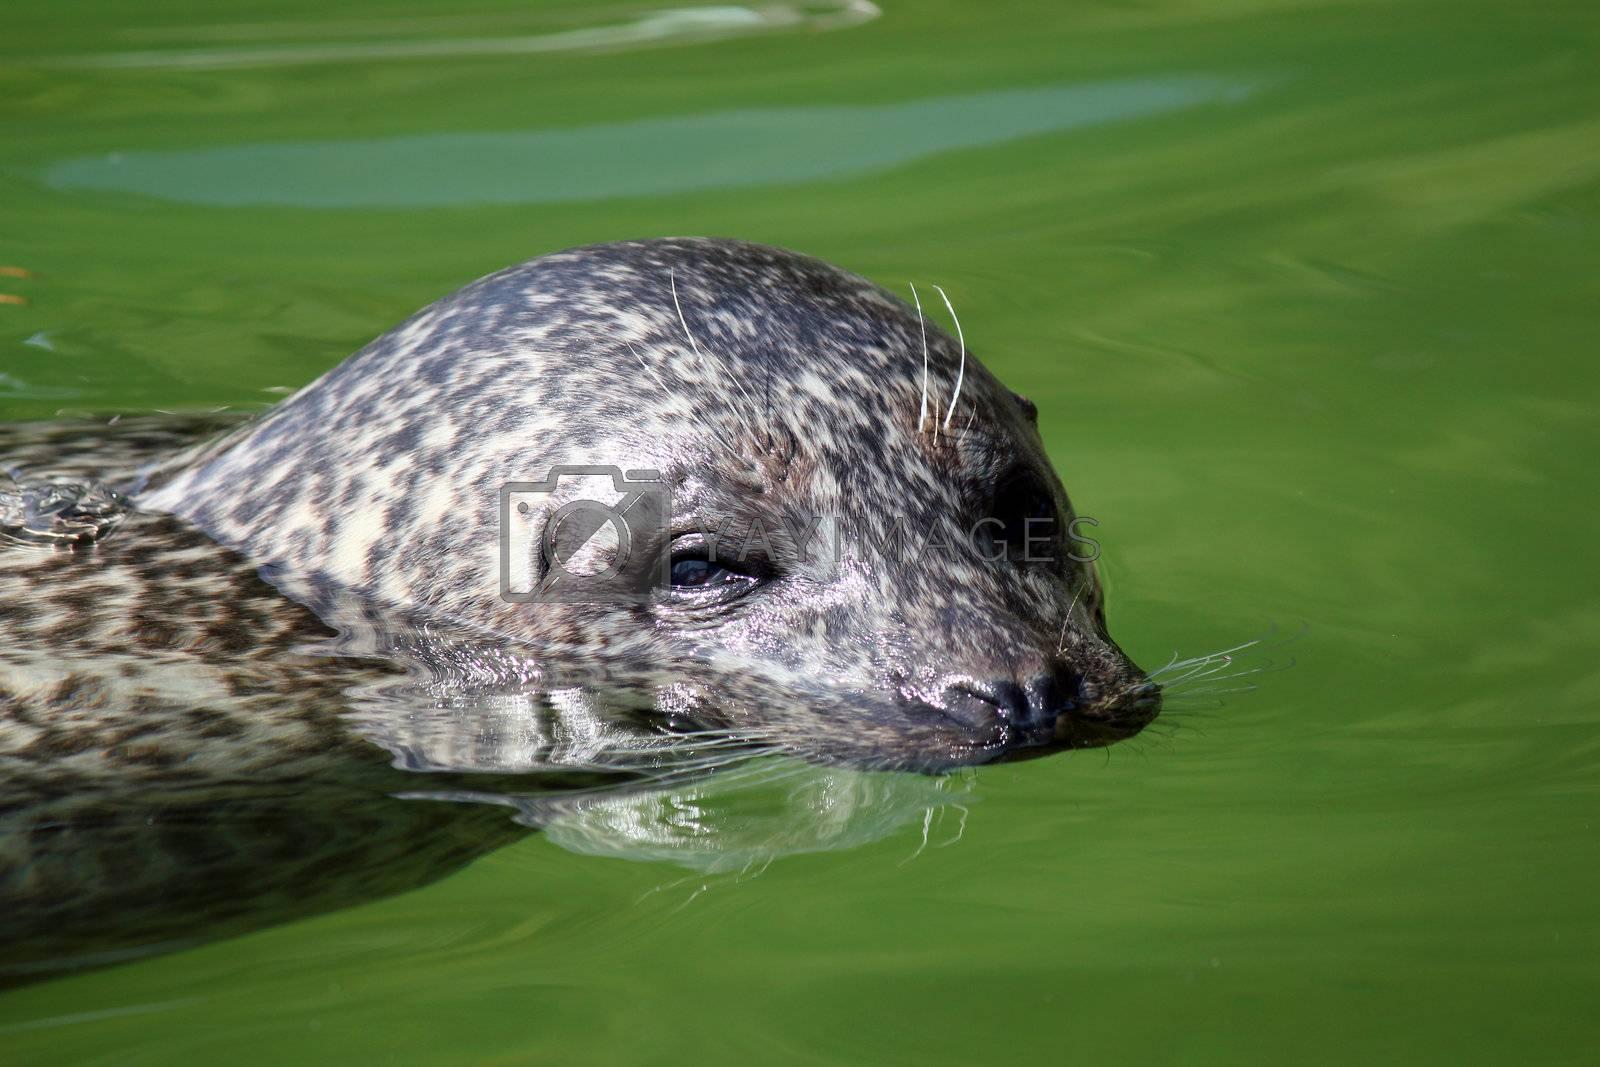 seal swimming portrait wildlife scene